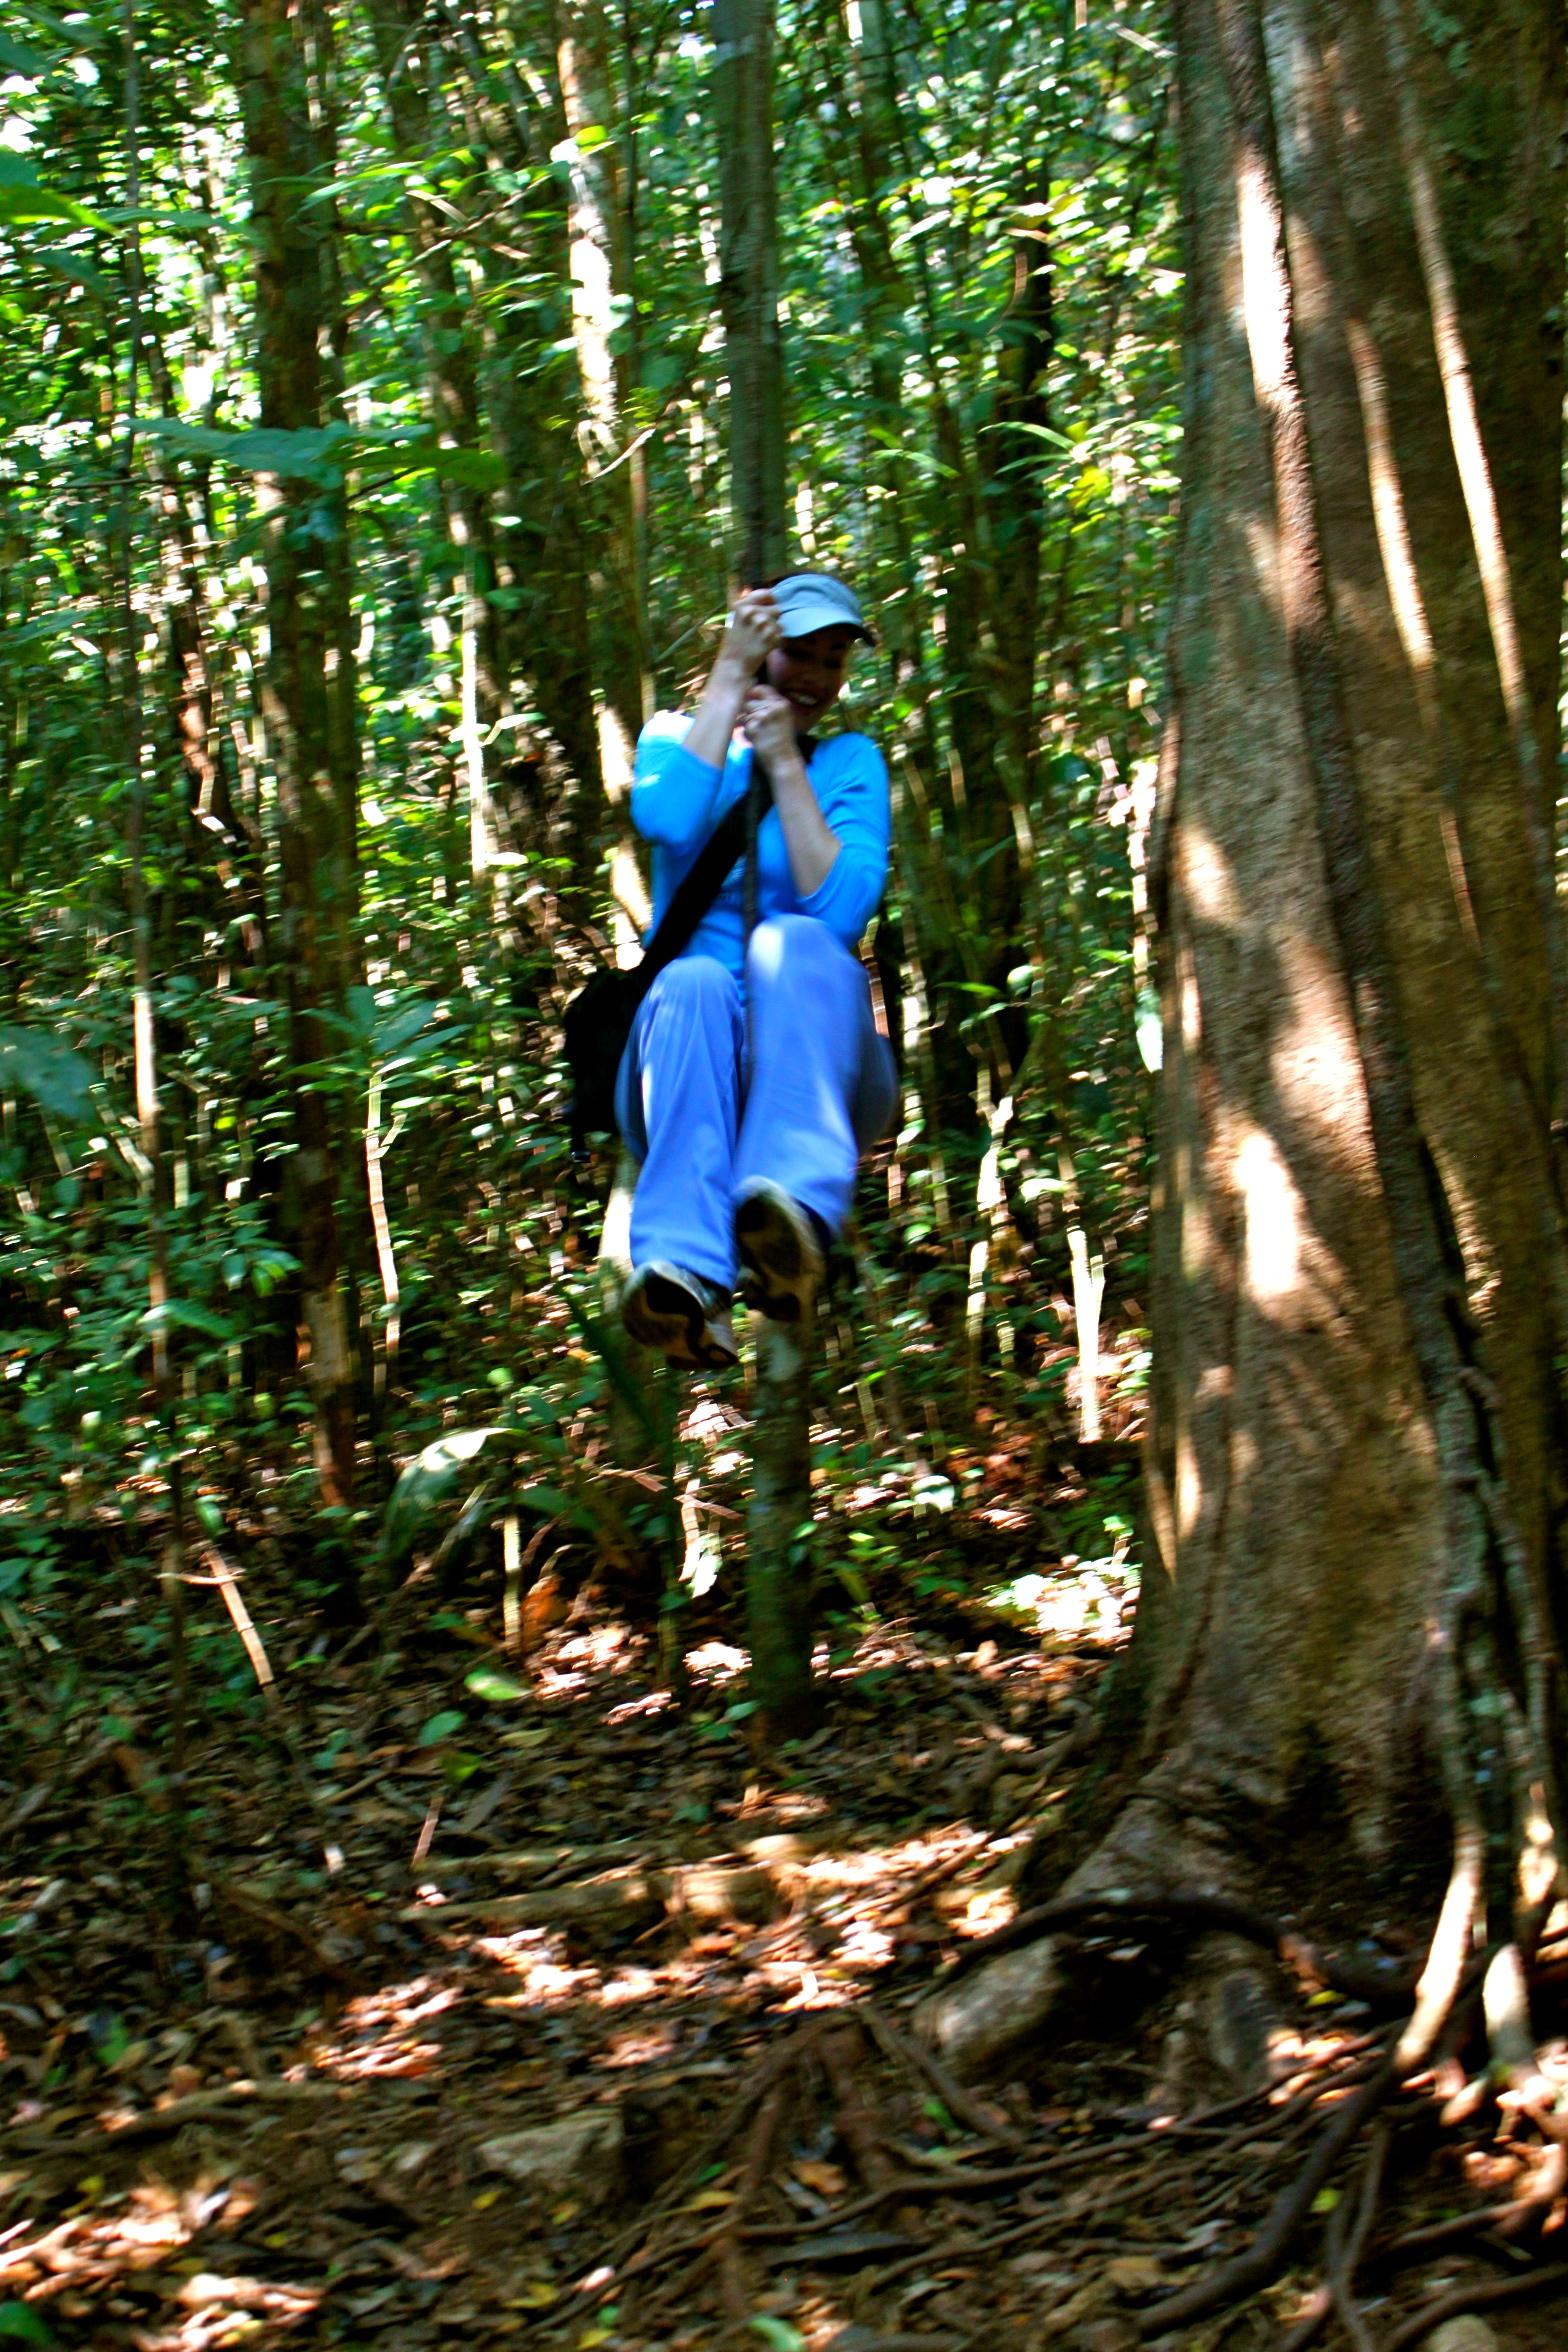 Swinging through the Amazon